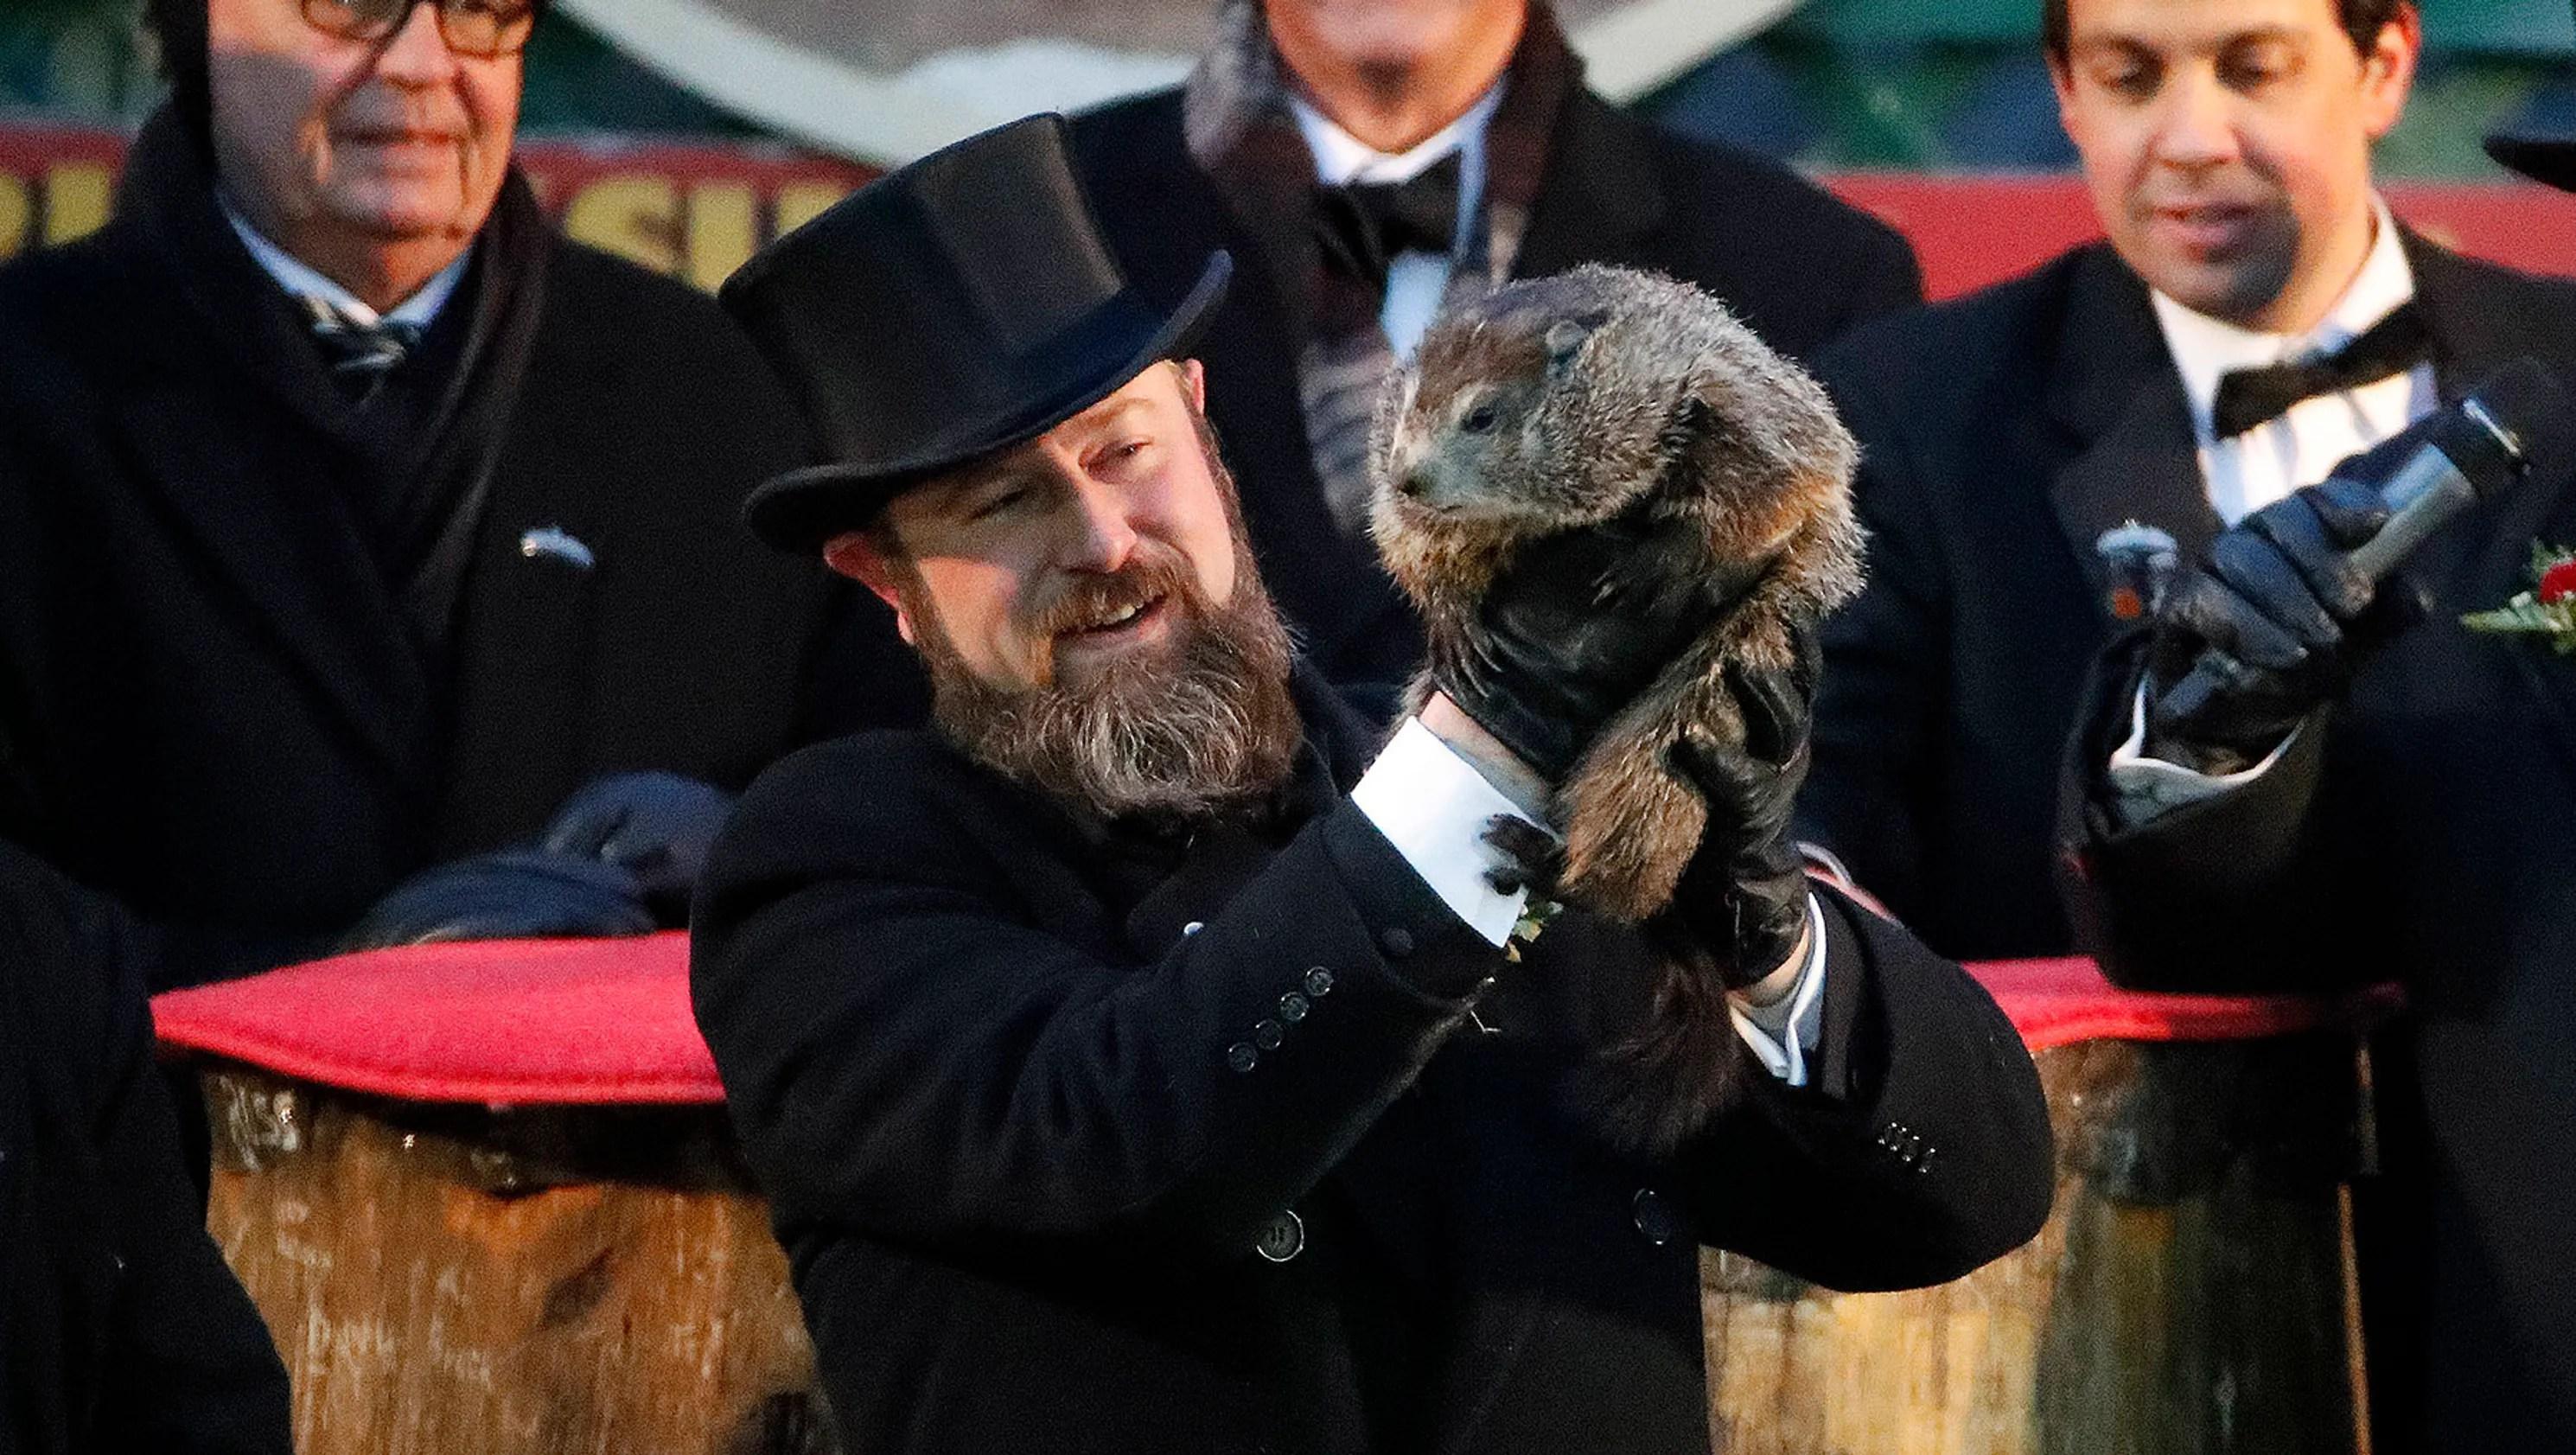 Groundhog Day Punxsutawney Phil Sees His Shadow